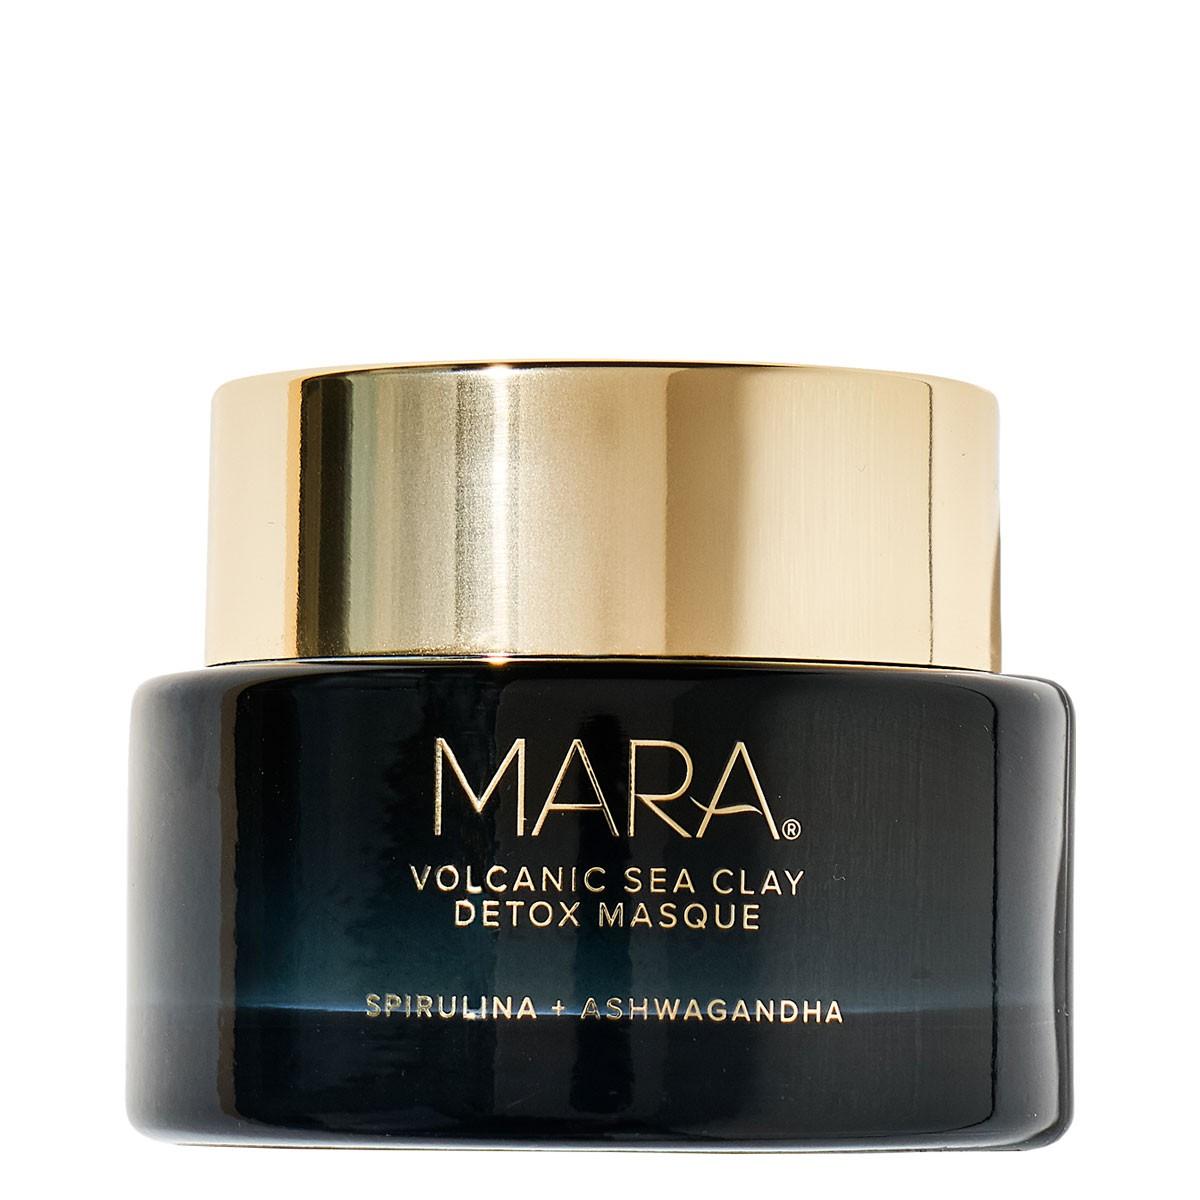 MARA Volcanic Sea Clay Detox Mask - Mascarilla détox que elimina completamente las impurezas de la piel.